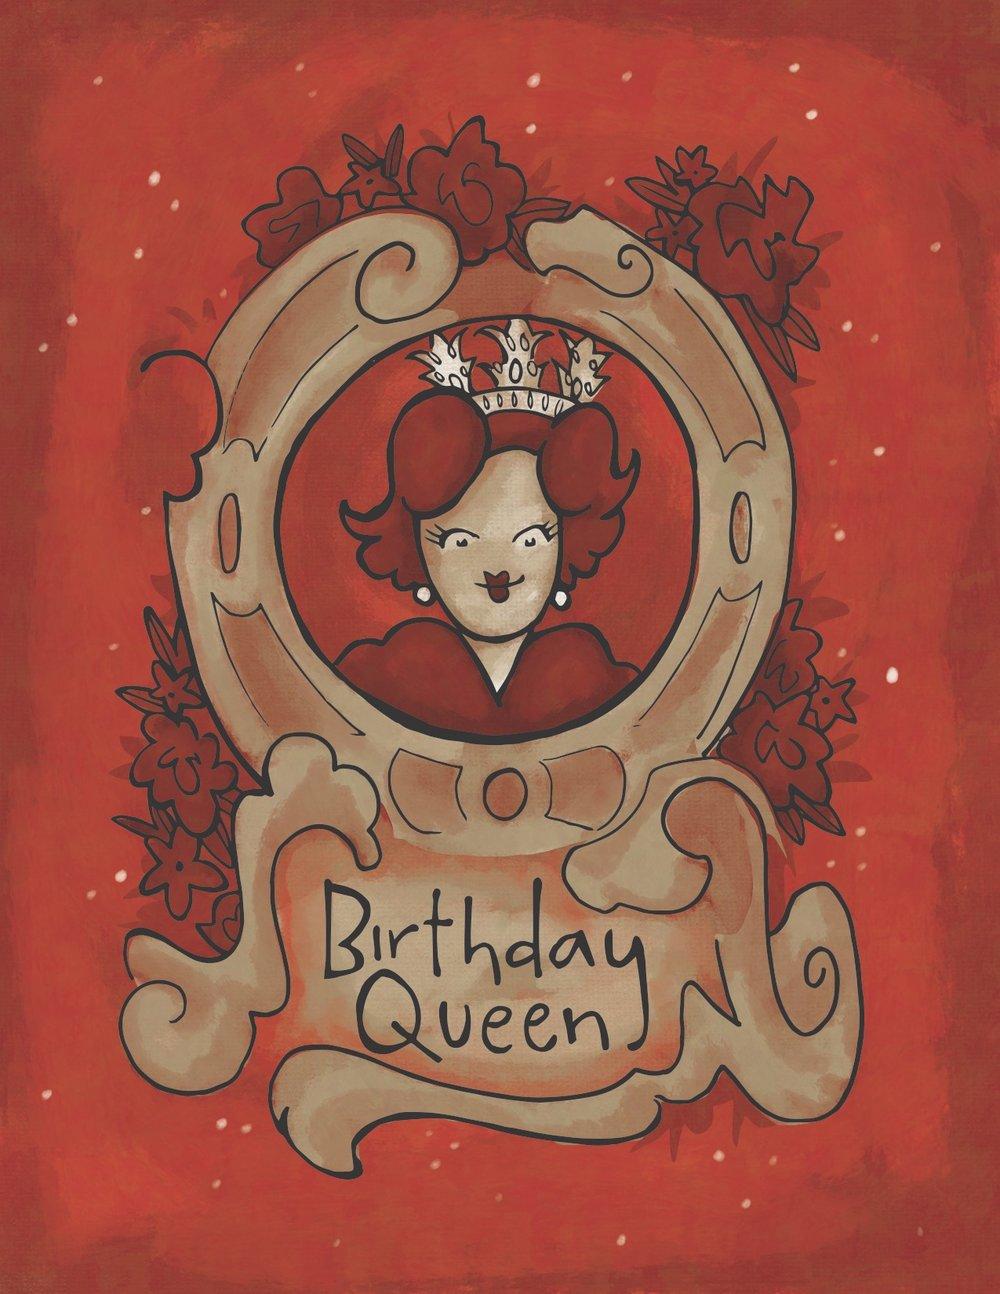 Birthday Queen.jpg